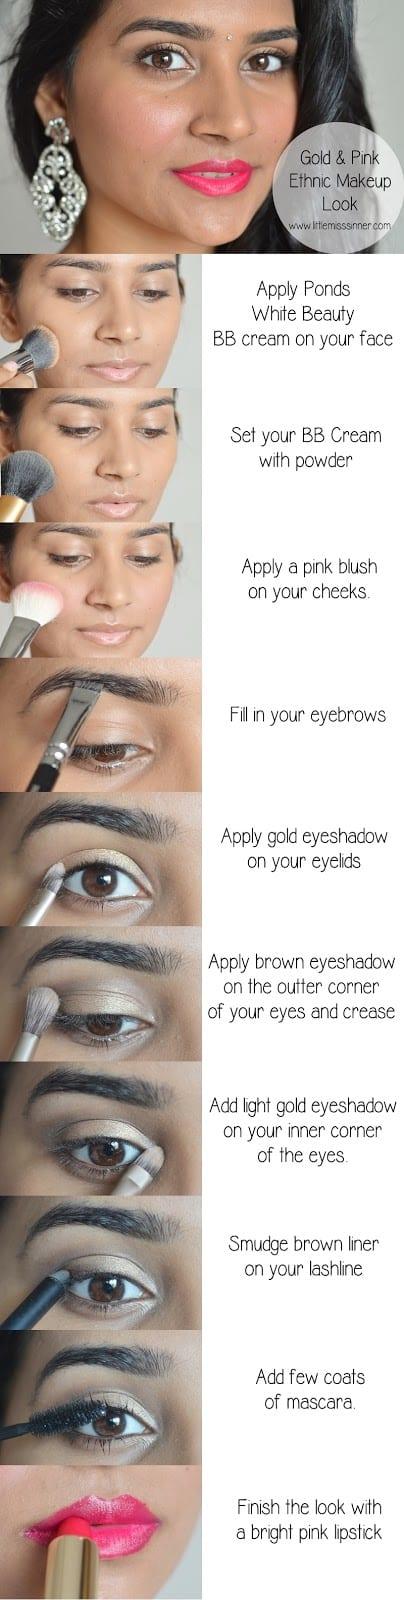 gold-pink-ethnic-makeup